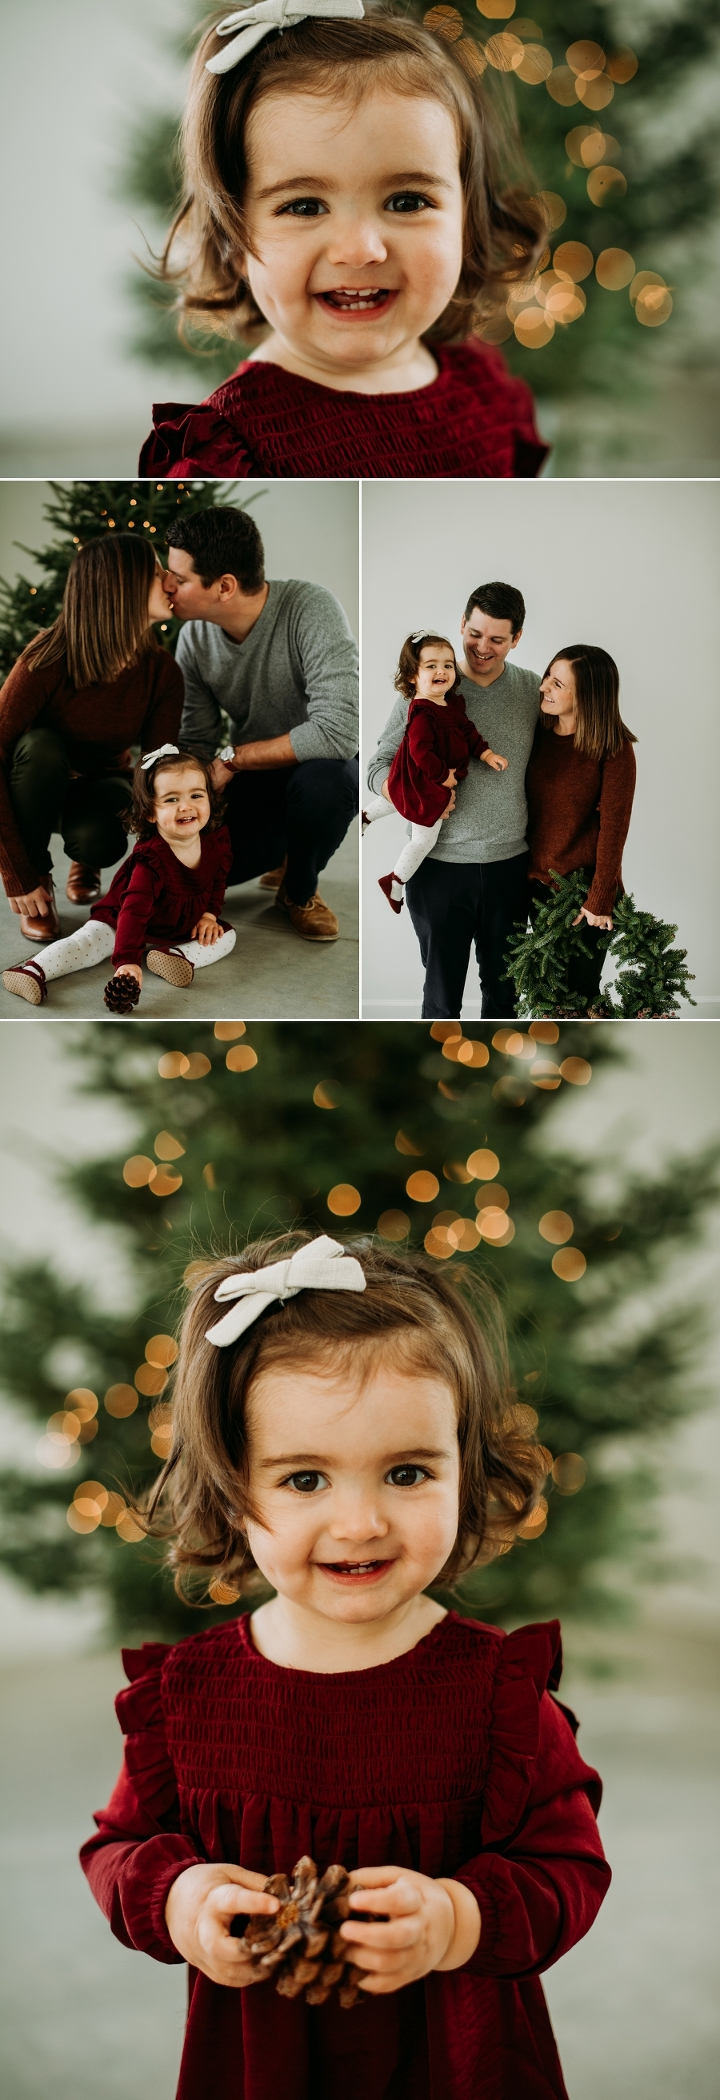 ChristmasMinis2018 9